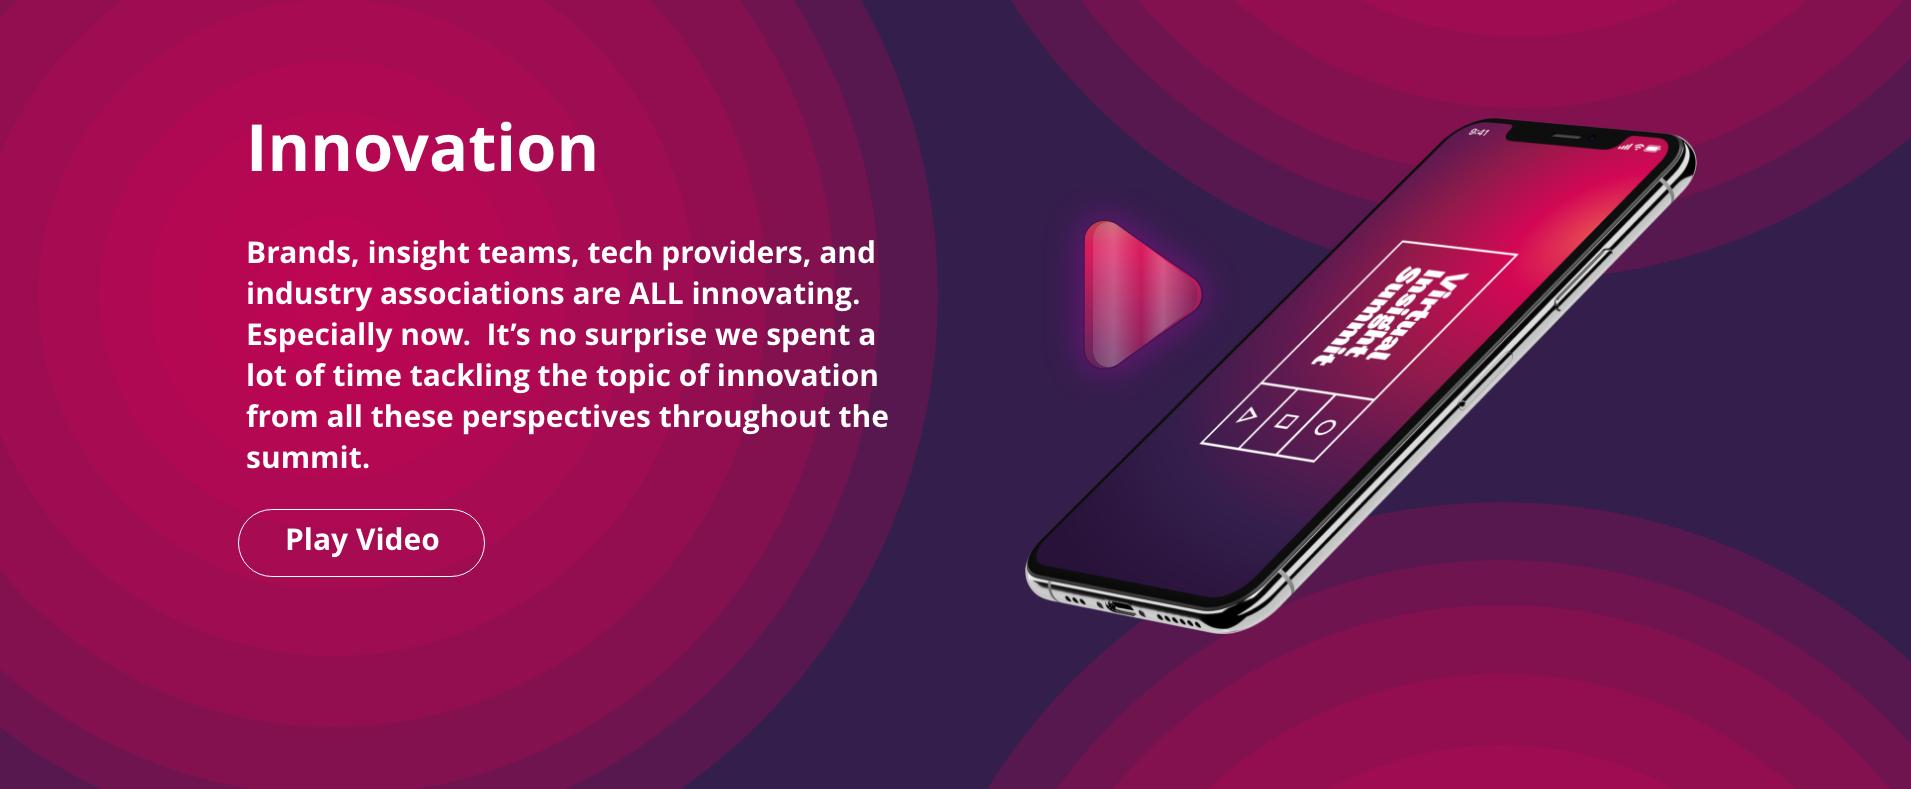 Theme 2 innovation